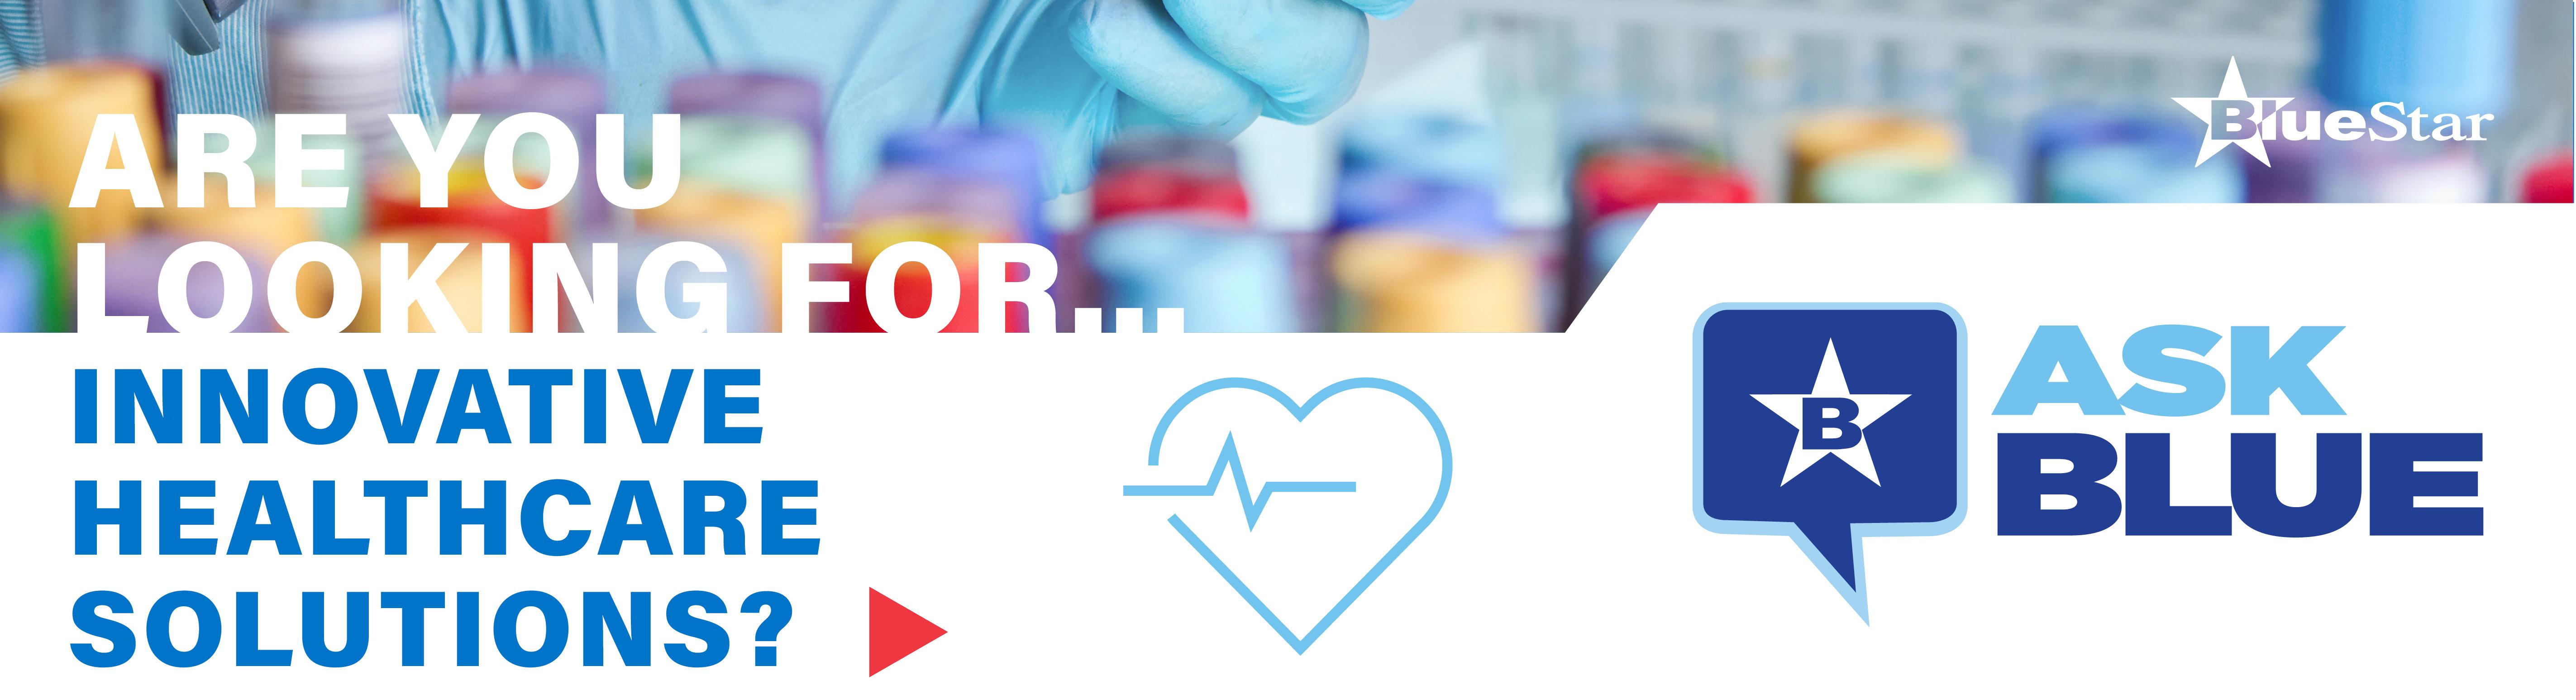 LPHeader-Healthcare-BlueStar